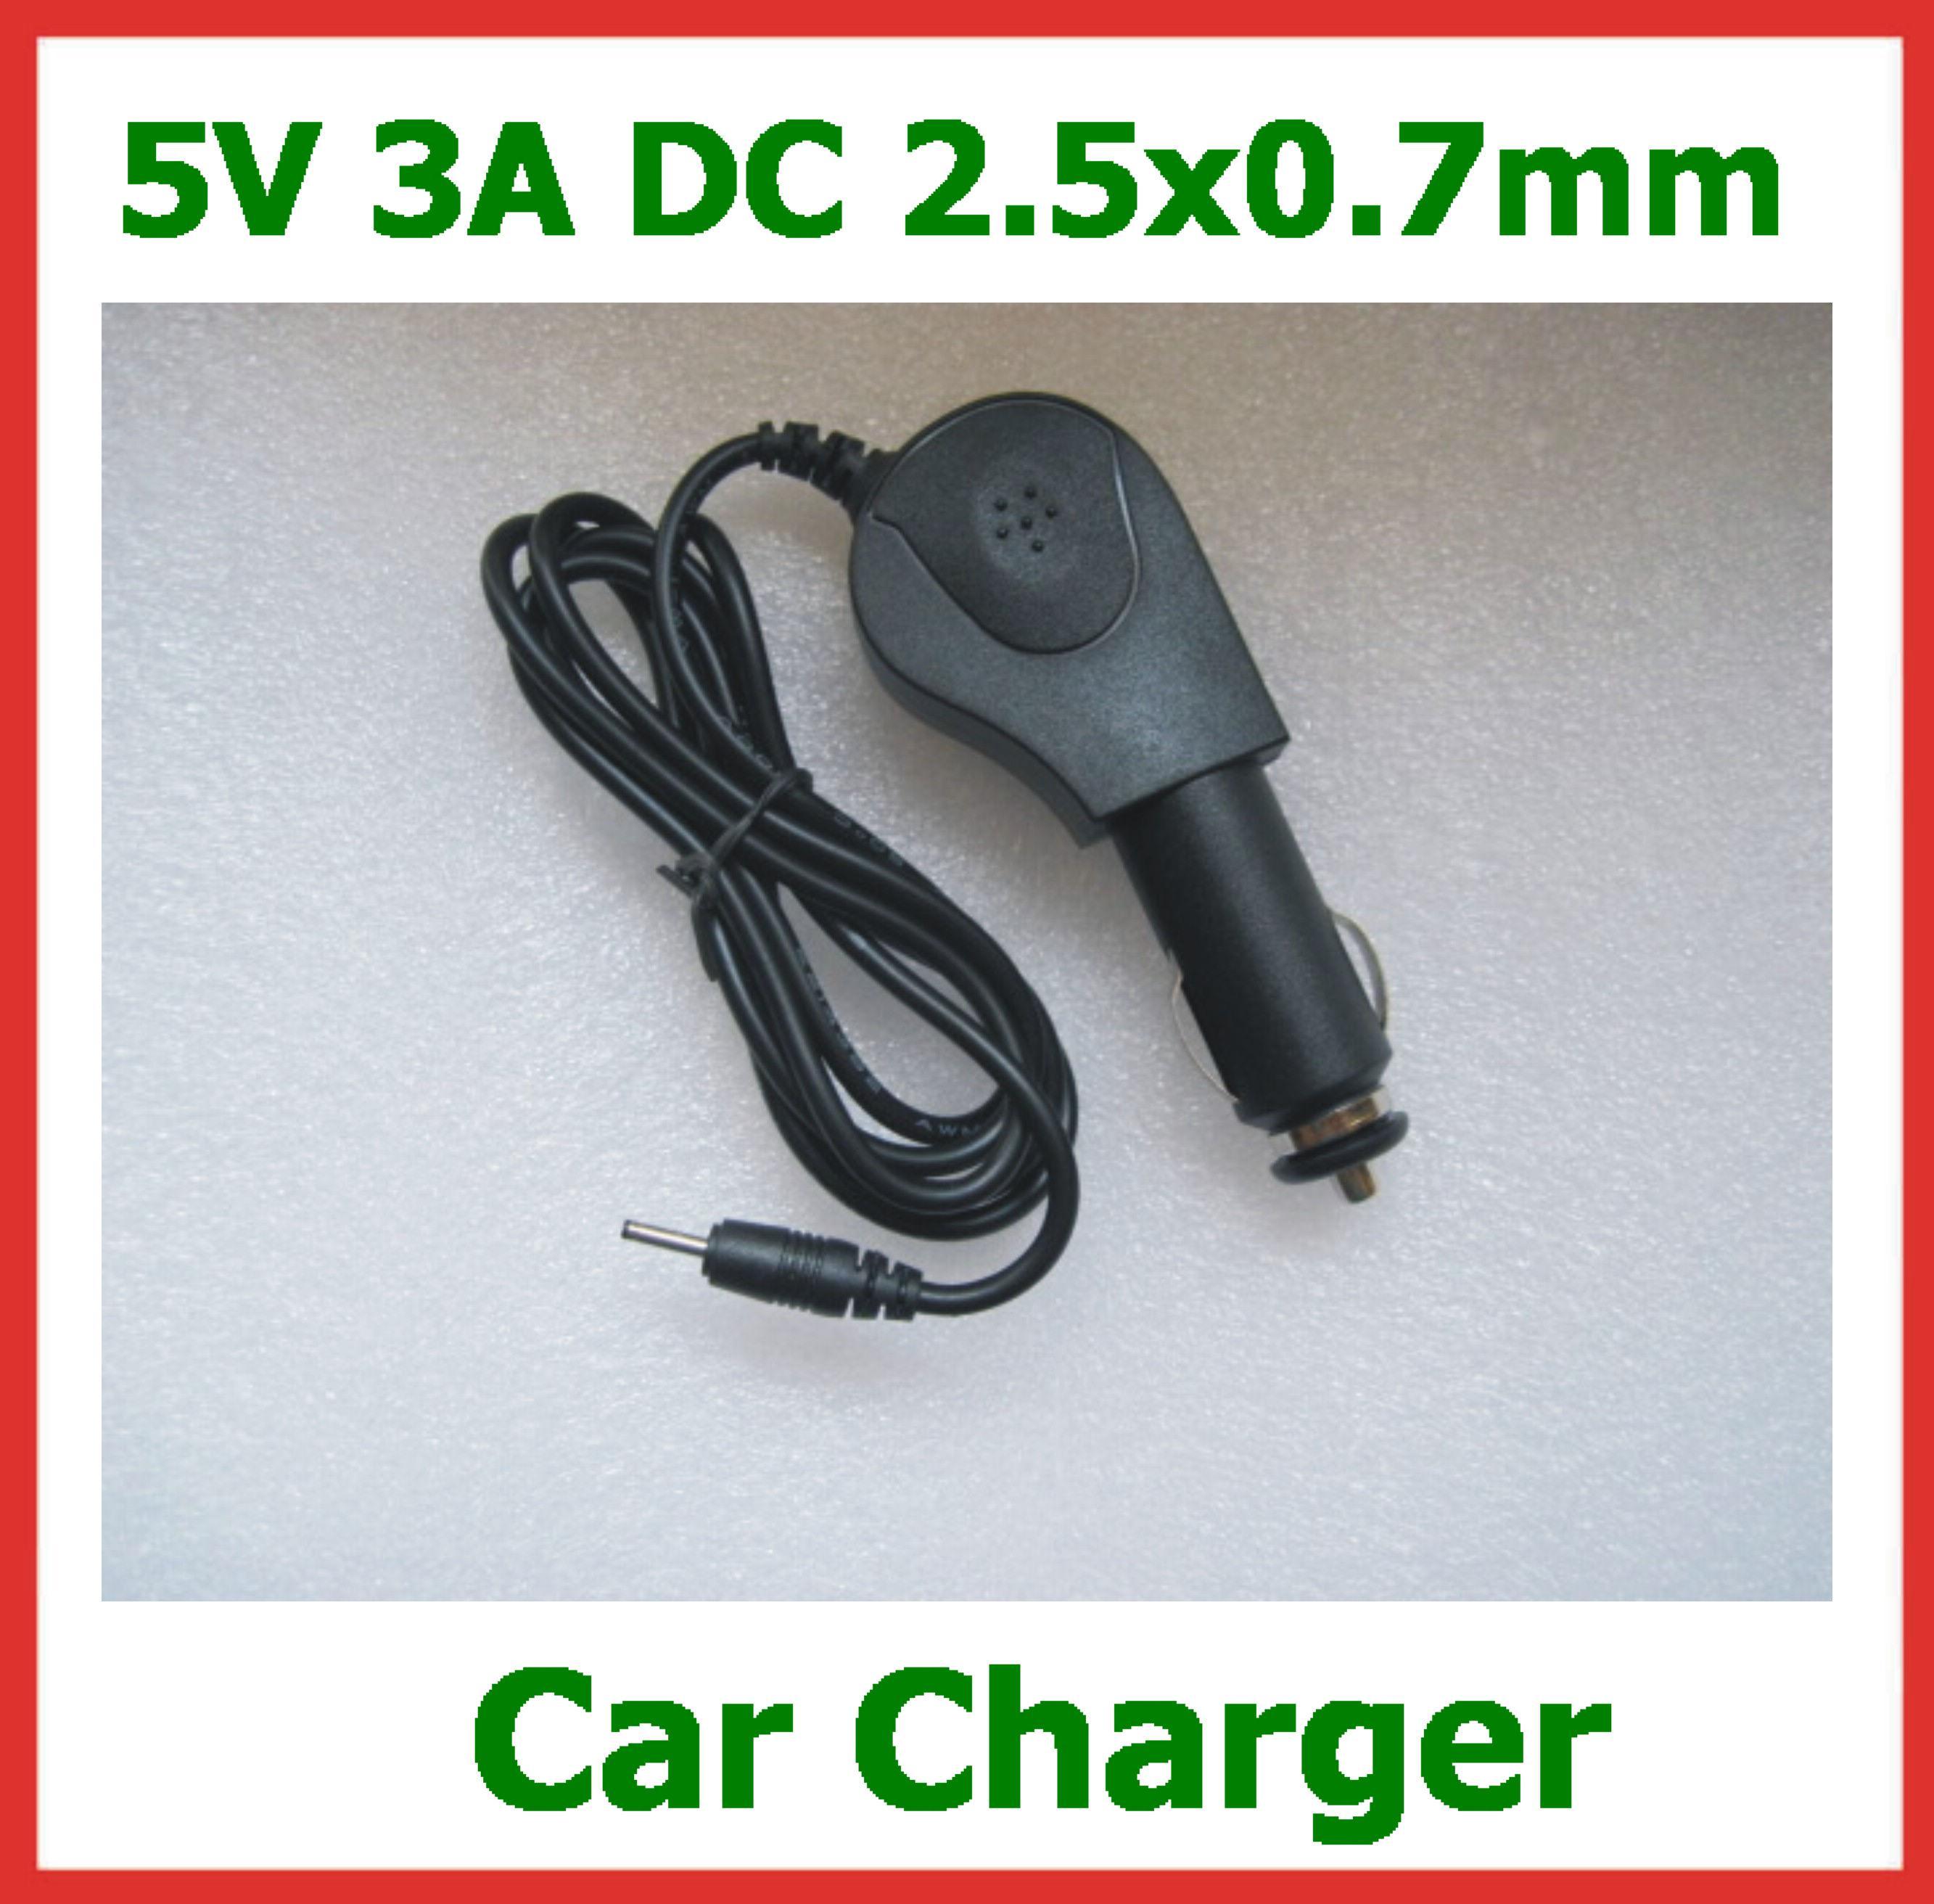 Buy 5V 3A 2.5mm Car charger Hyundai T10 T7S T7 Quad Core Android Tablet PC Ployer MOMO19 MOMO20 Chuwi V99 Ainol Hero II Sanei N10 Ampe A10